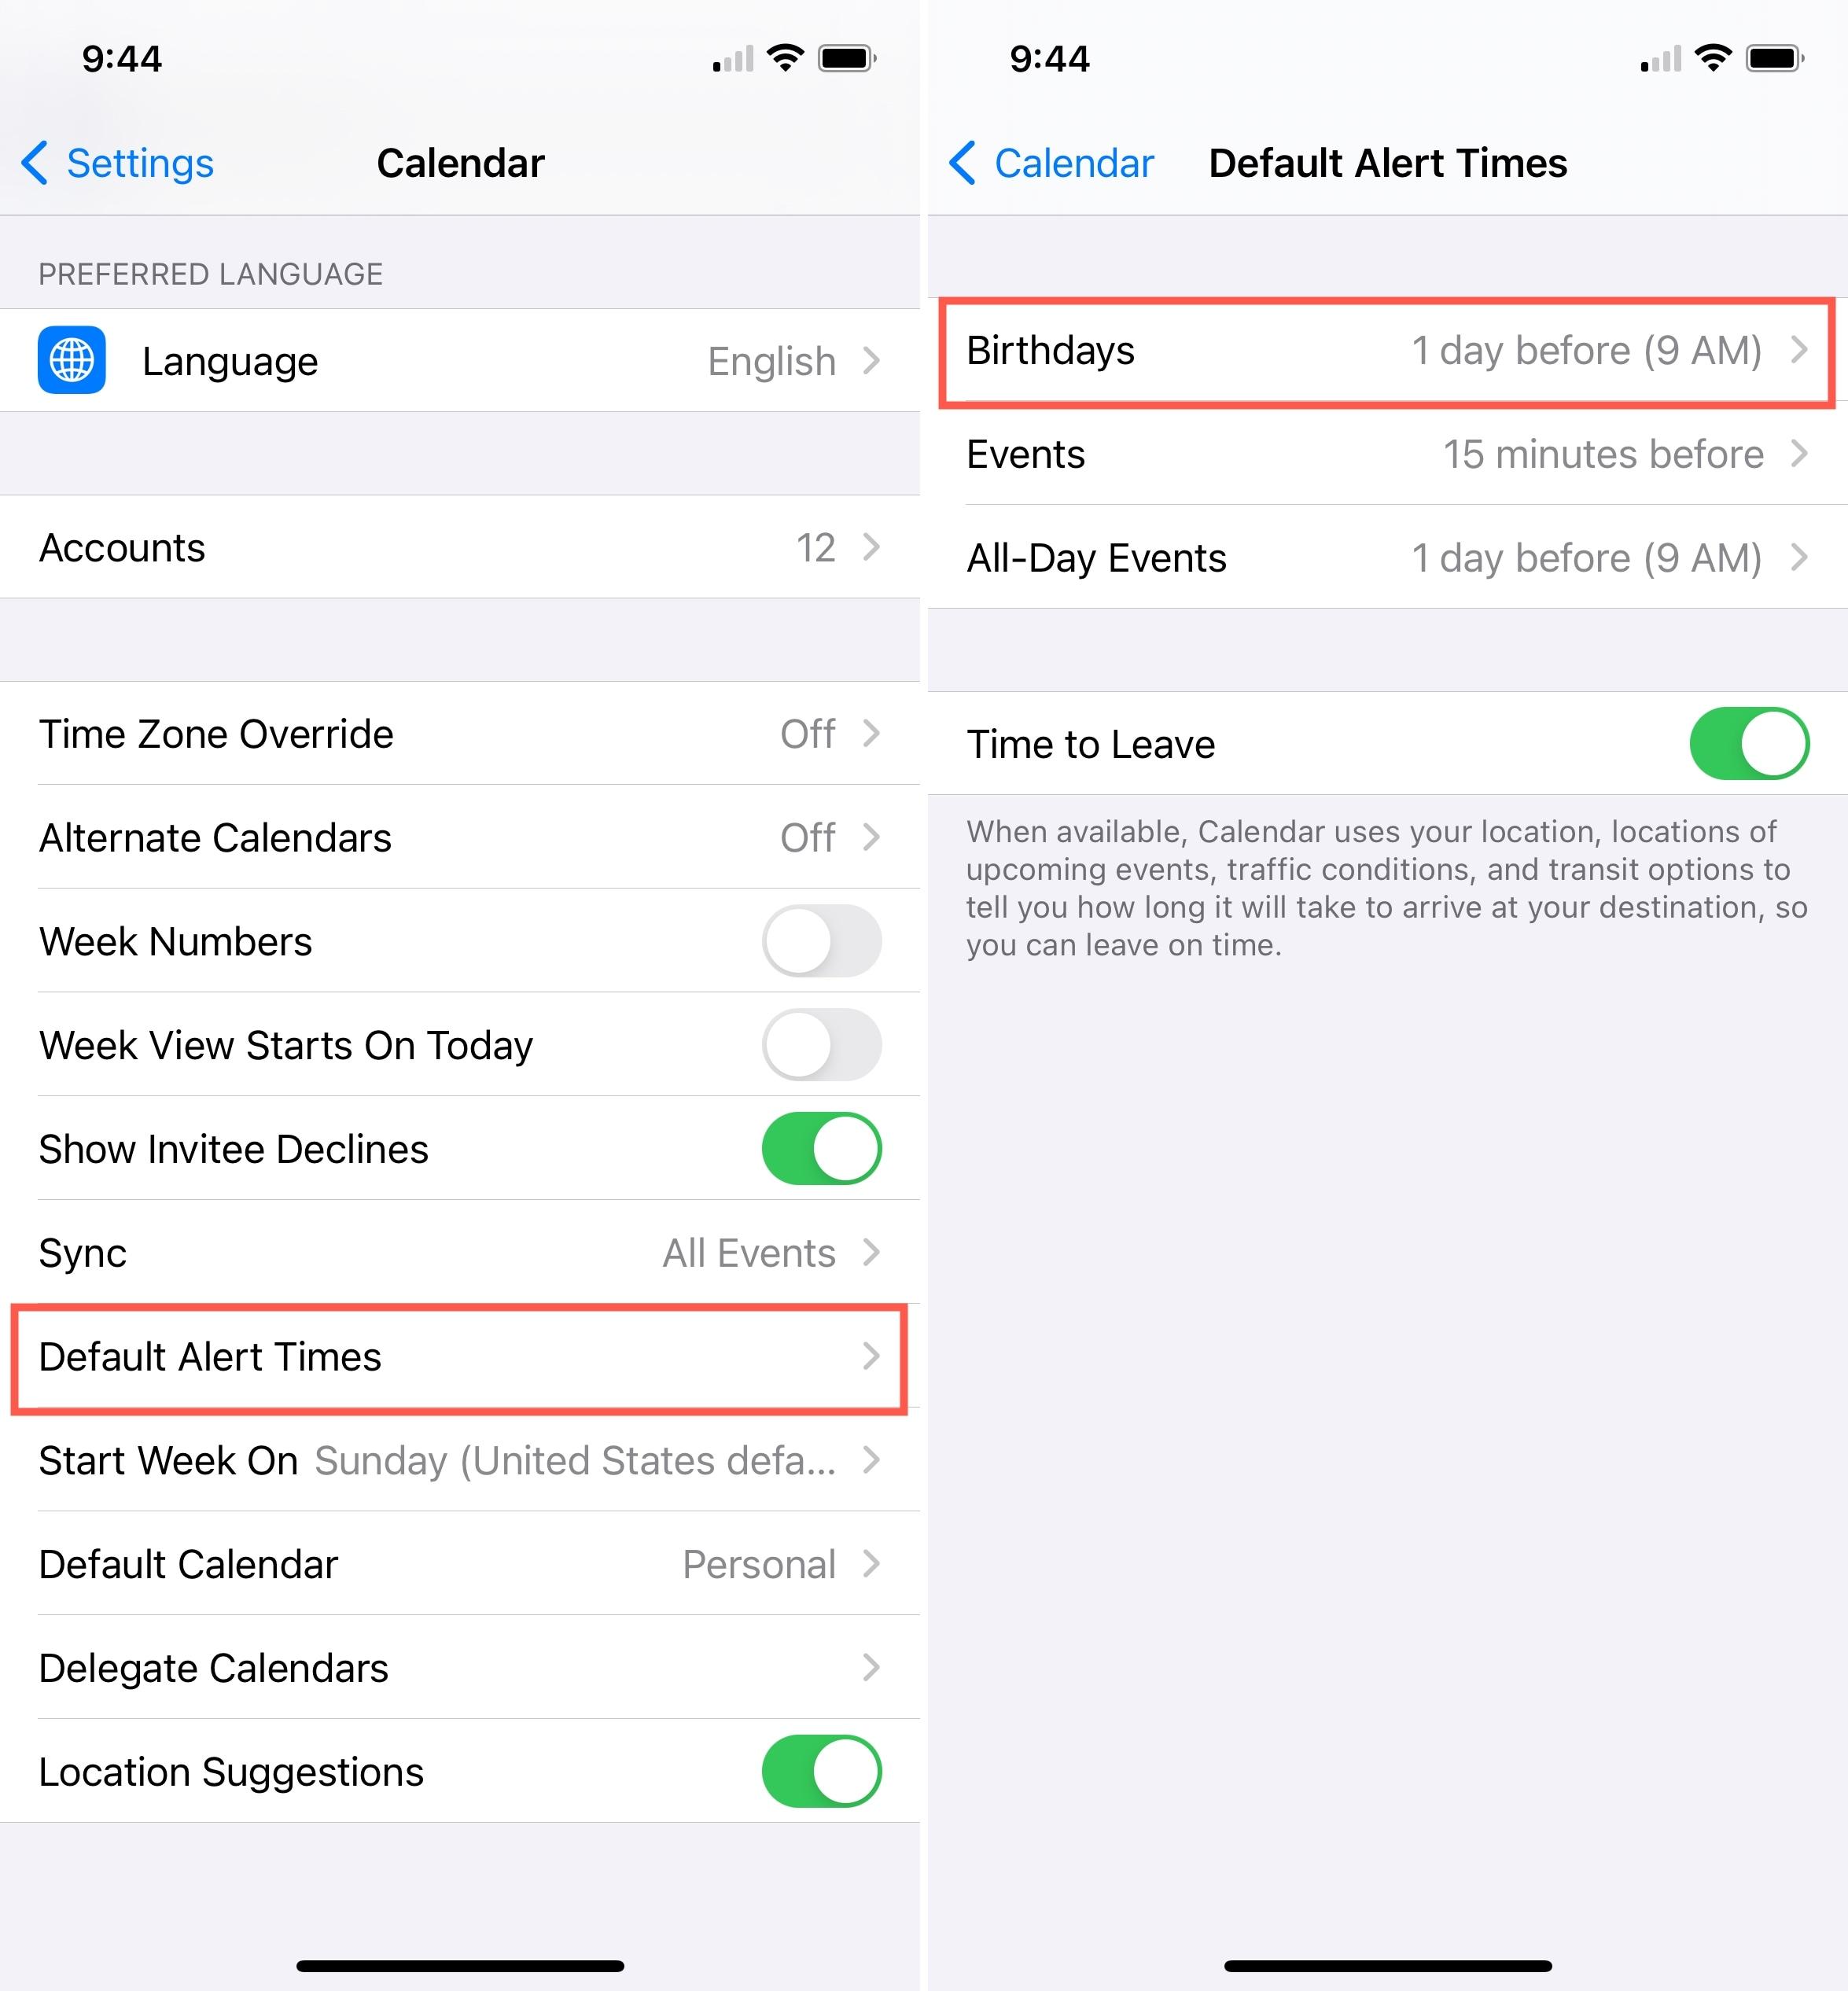 Calendar Alerts for Birthdays on iPhone